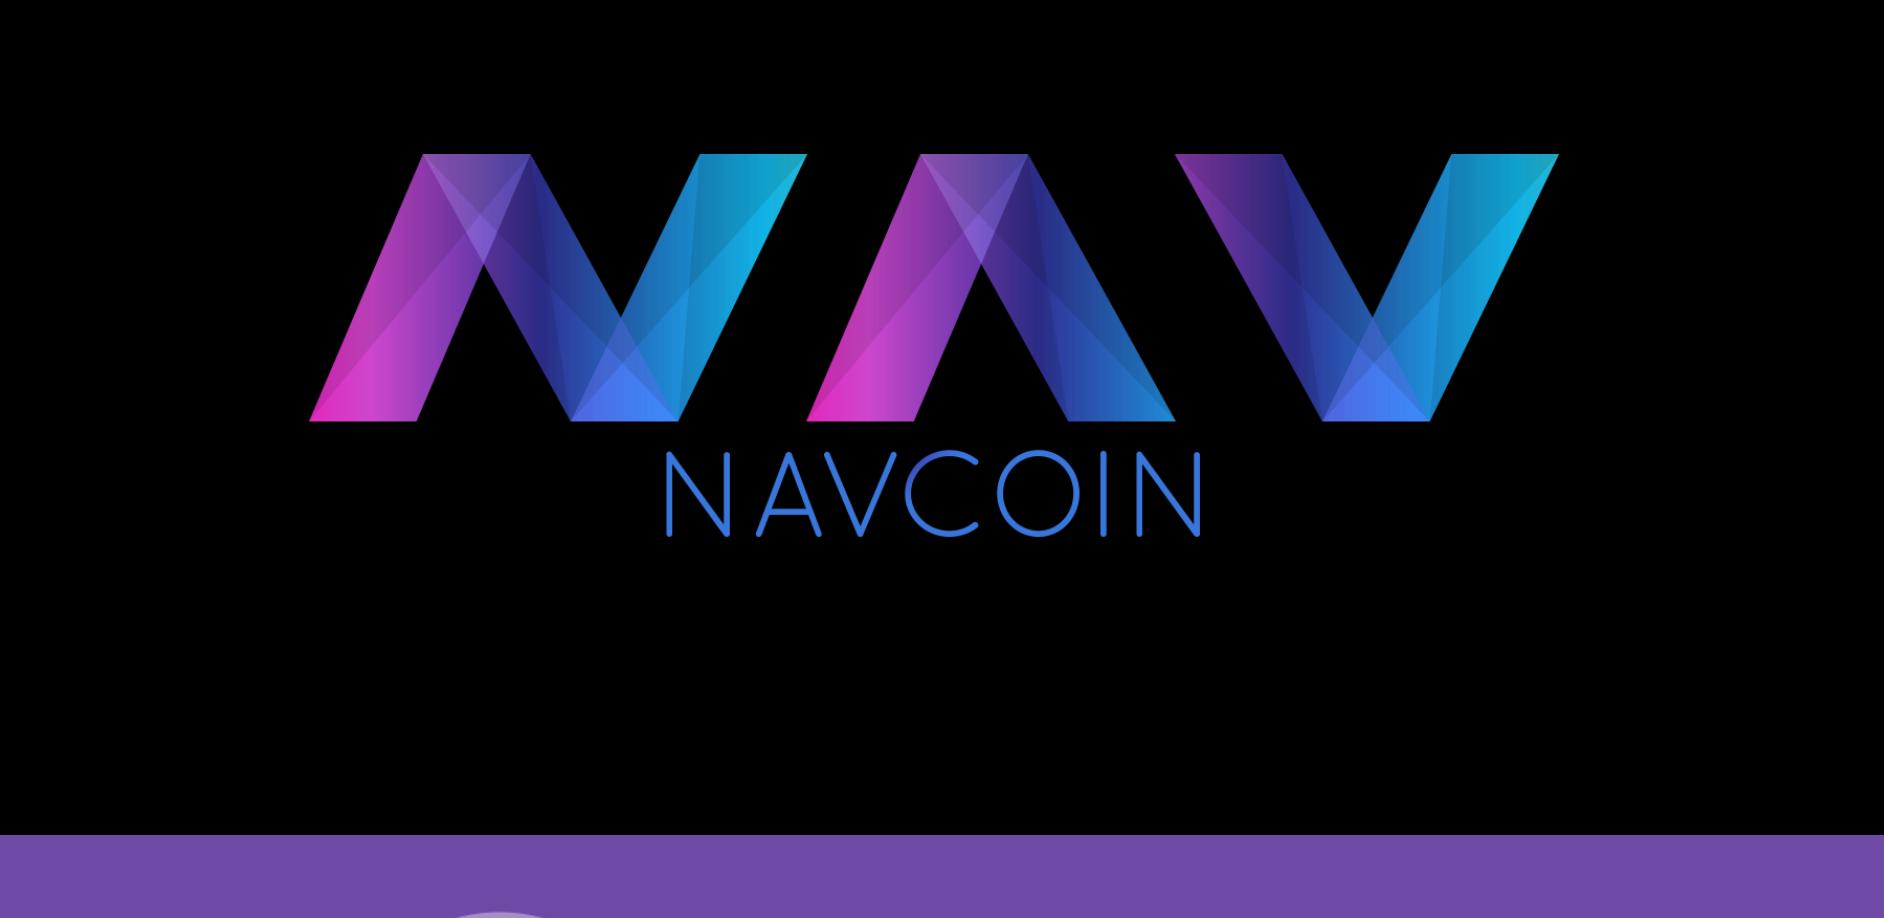 NavCoin